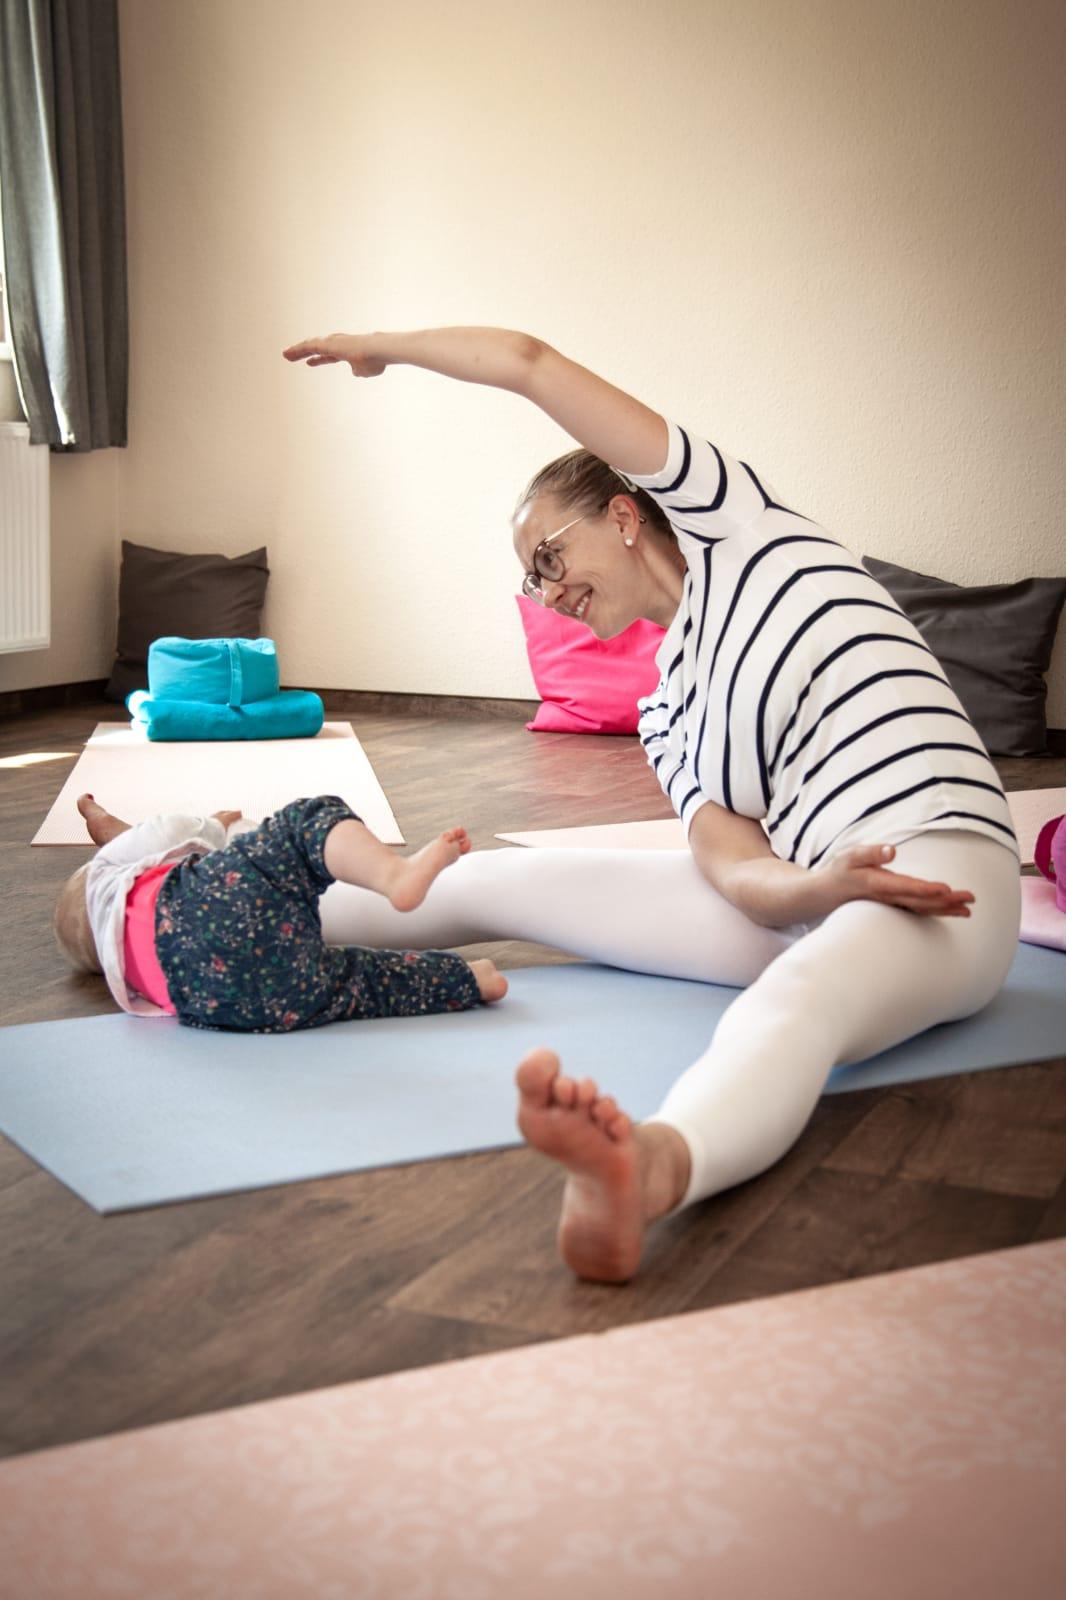 Schwangeren Yoga für Schwangere Weißensee Weissensee Pankow Treptow Mitte Berlin Antje Pohl Pekip